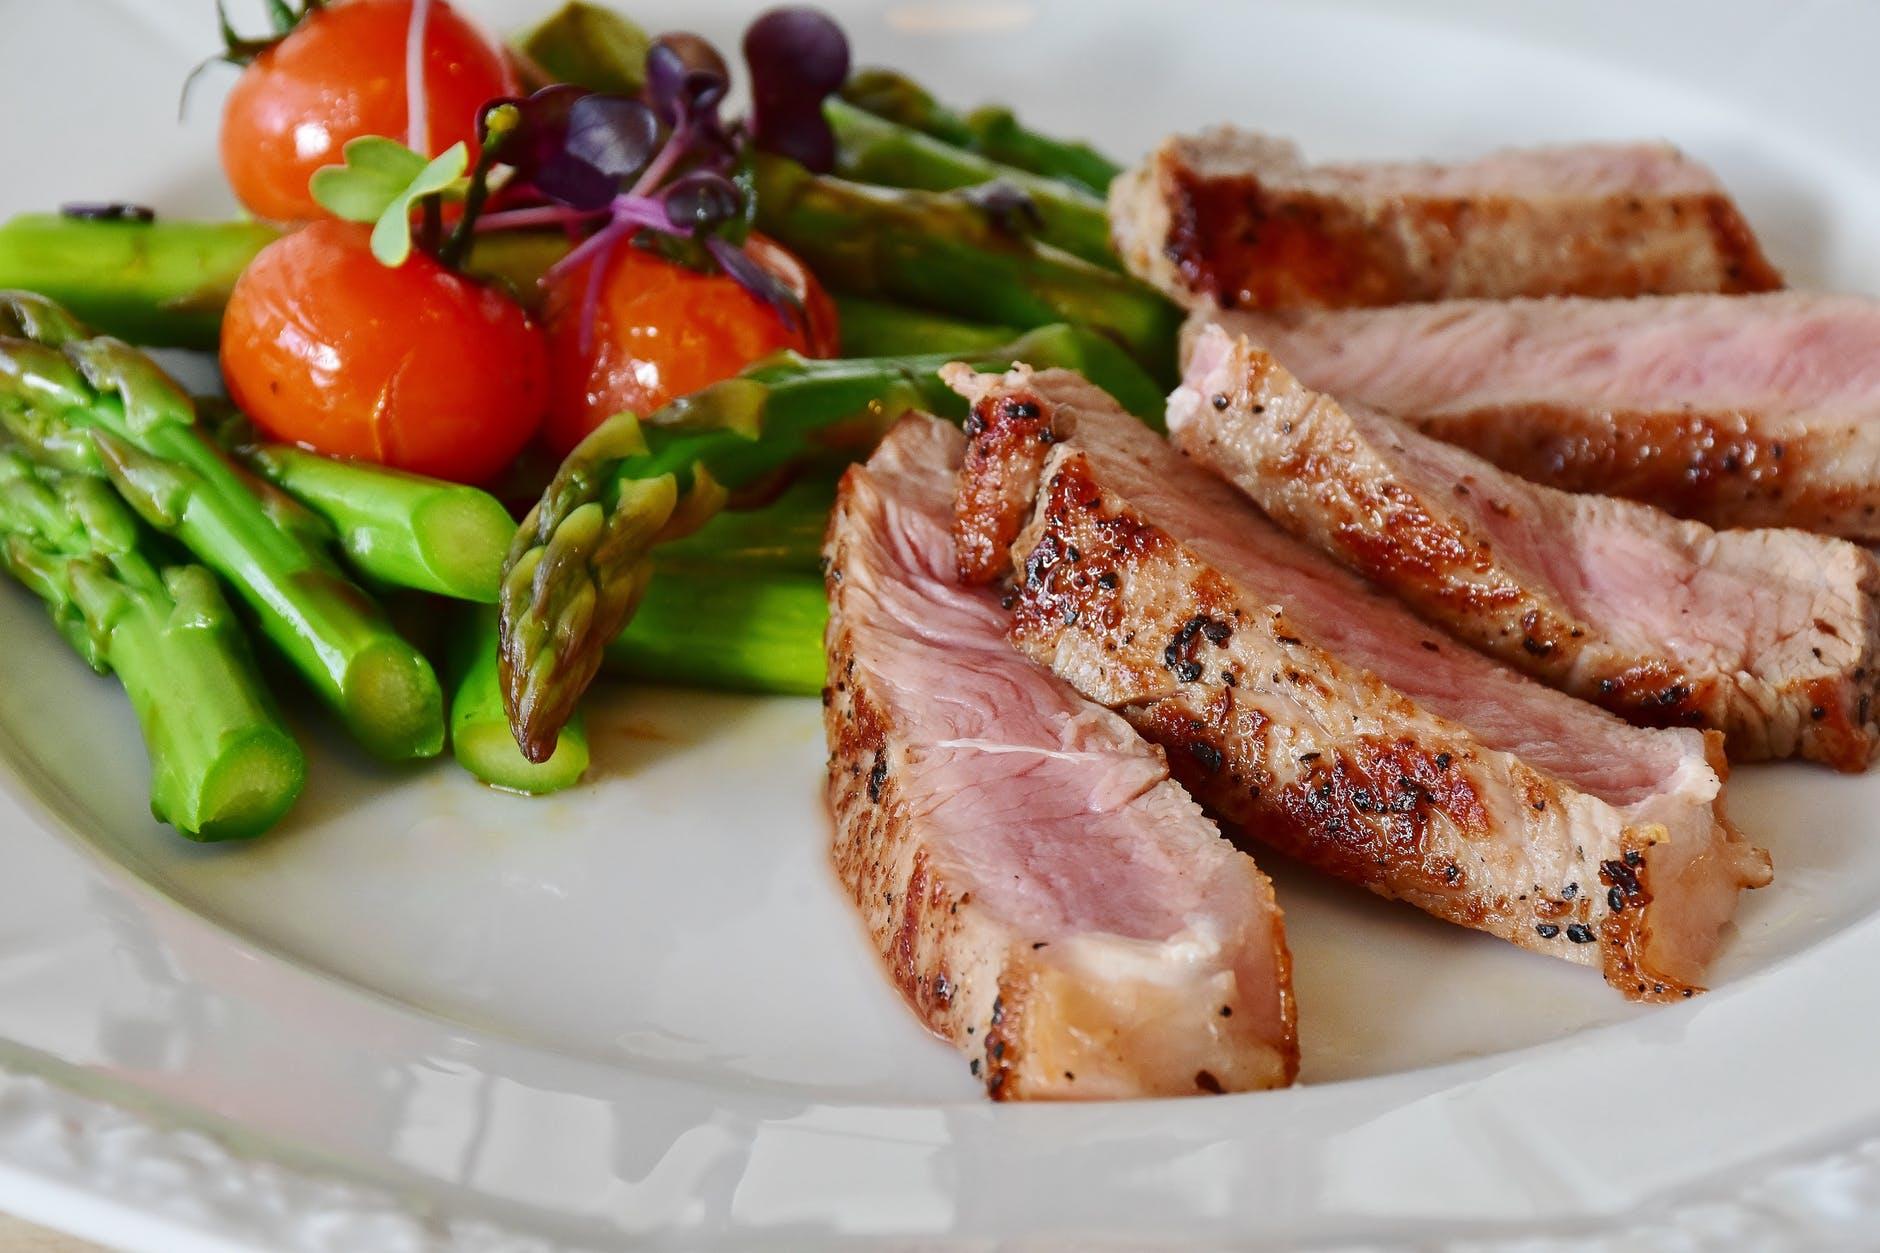 The Palto-asparagus-steak-veal-steak-veal-361184.jpeg